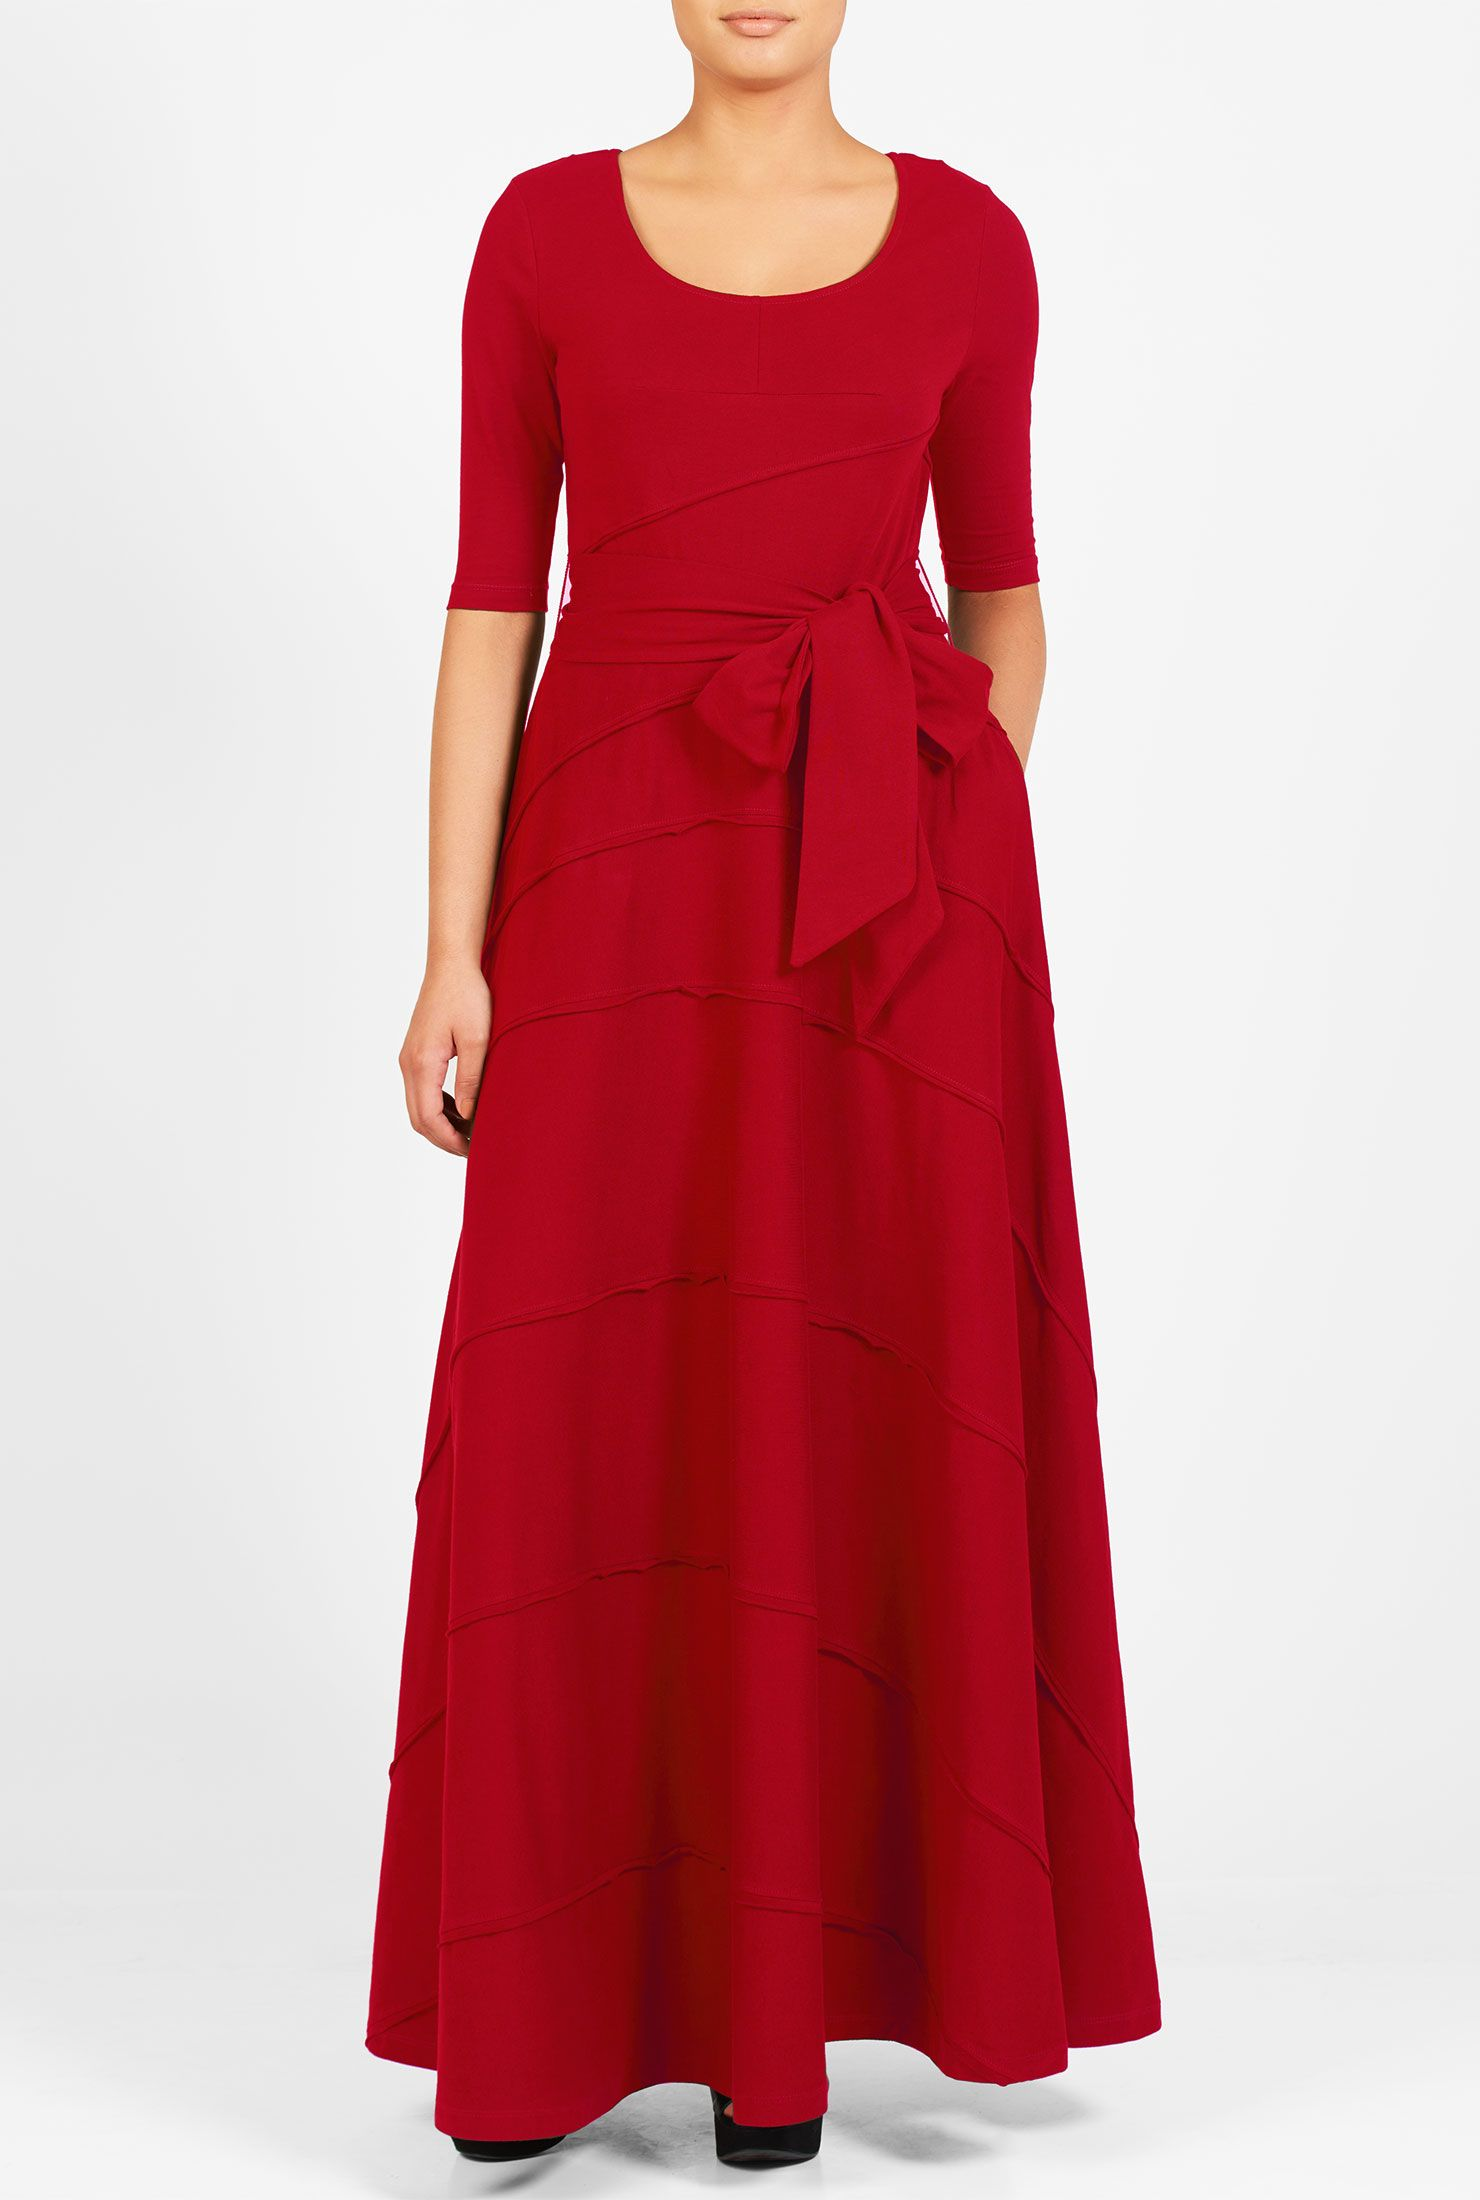 Elbow Length Sleeve Maxi Dresses Full Length Dresses Jersey Knit